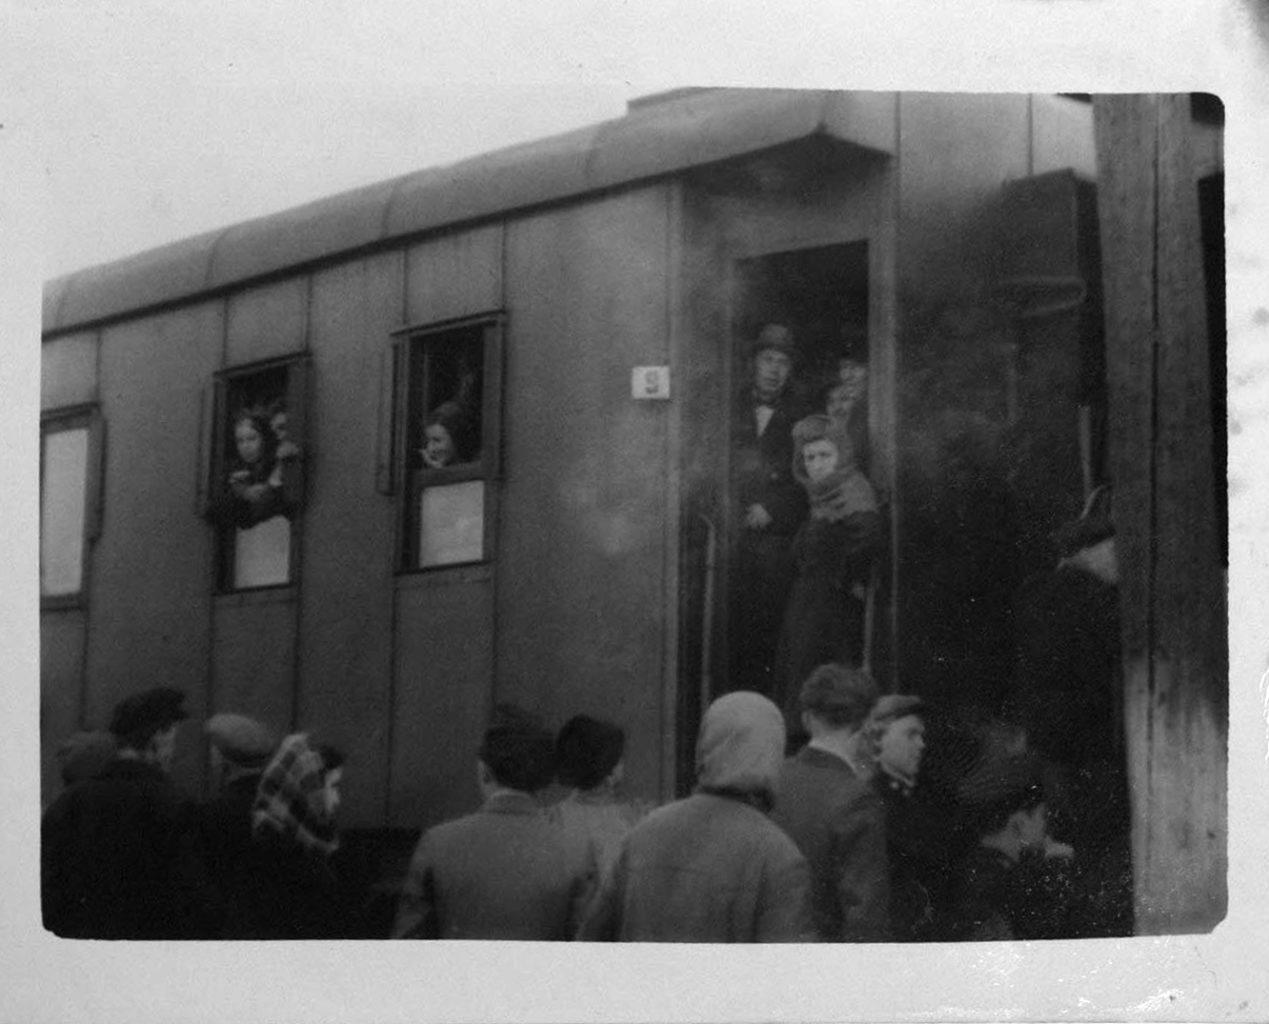 На гастроли по области (в центре – П. Князев). 1950 г.: фотография